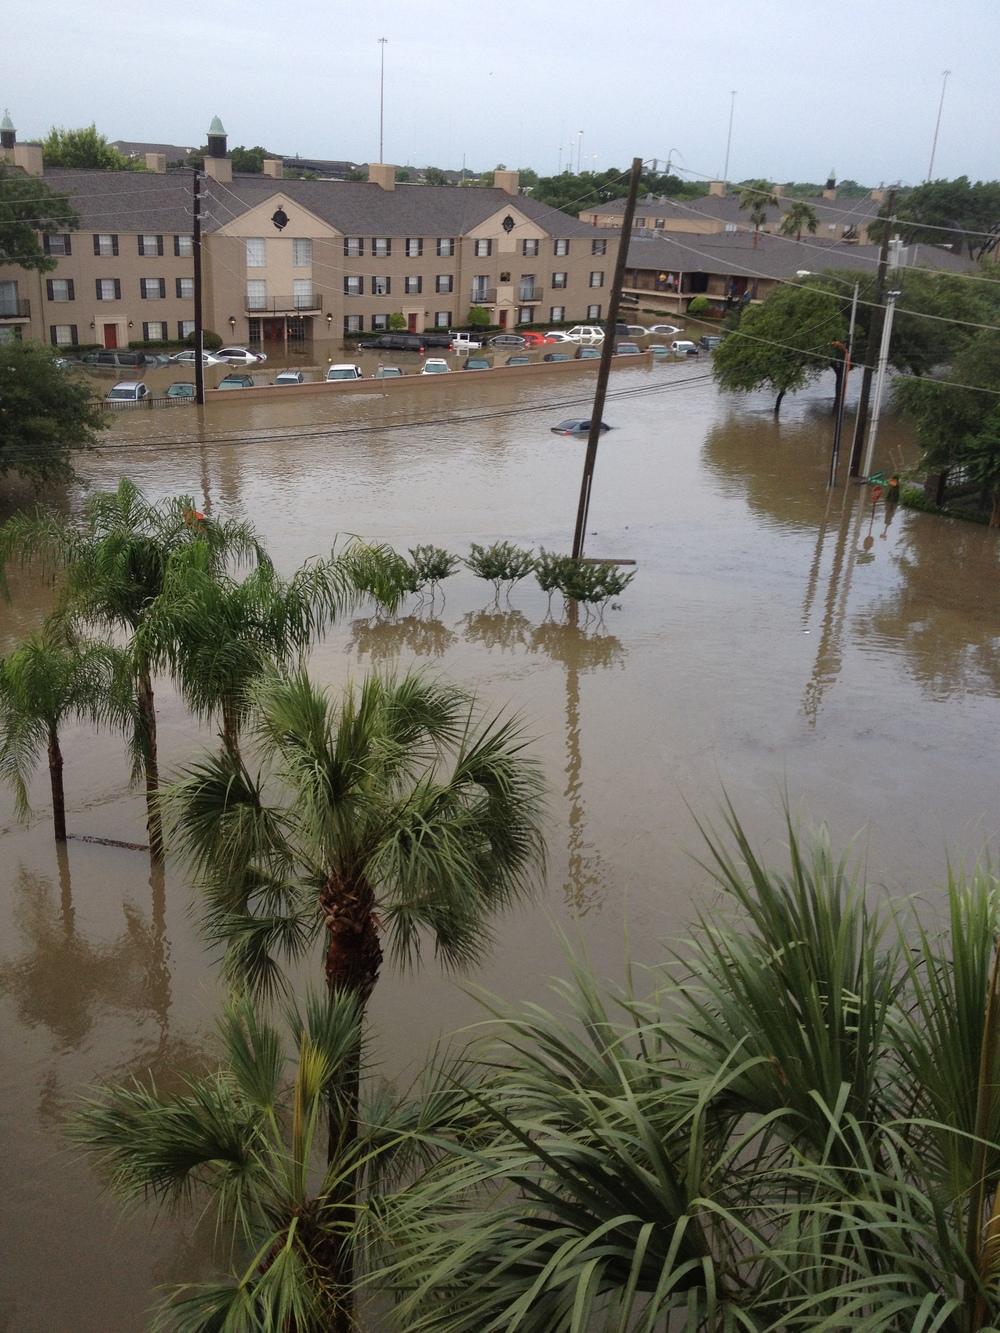 Flooding in Houston on Tuesday. Credit: Jacob Kamaras.